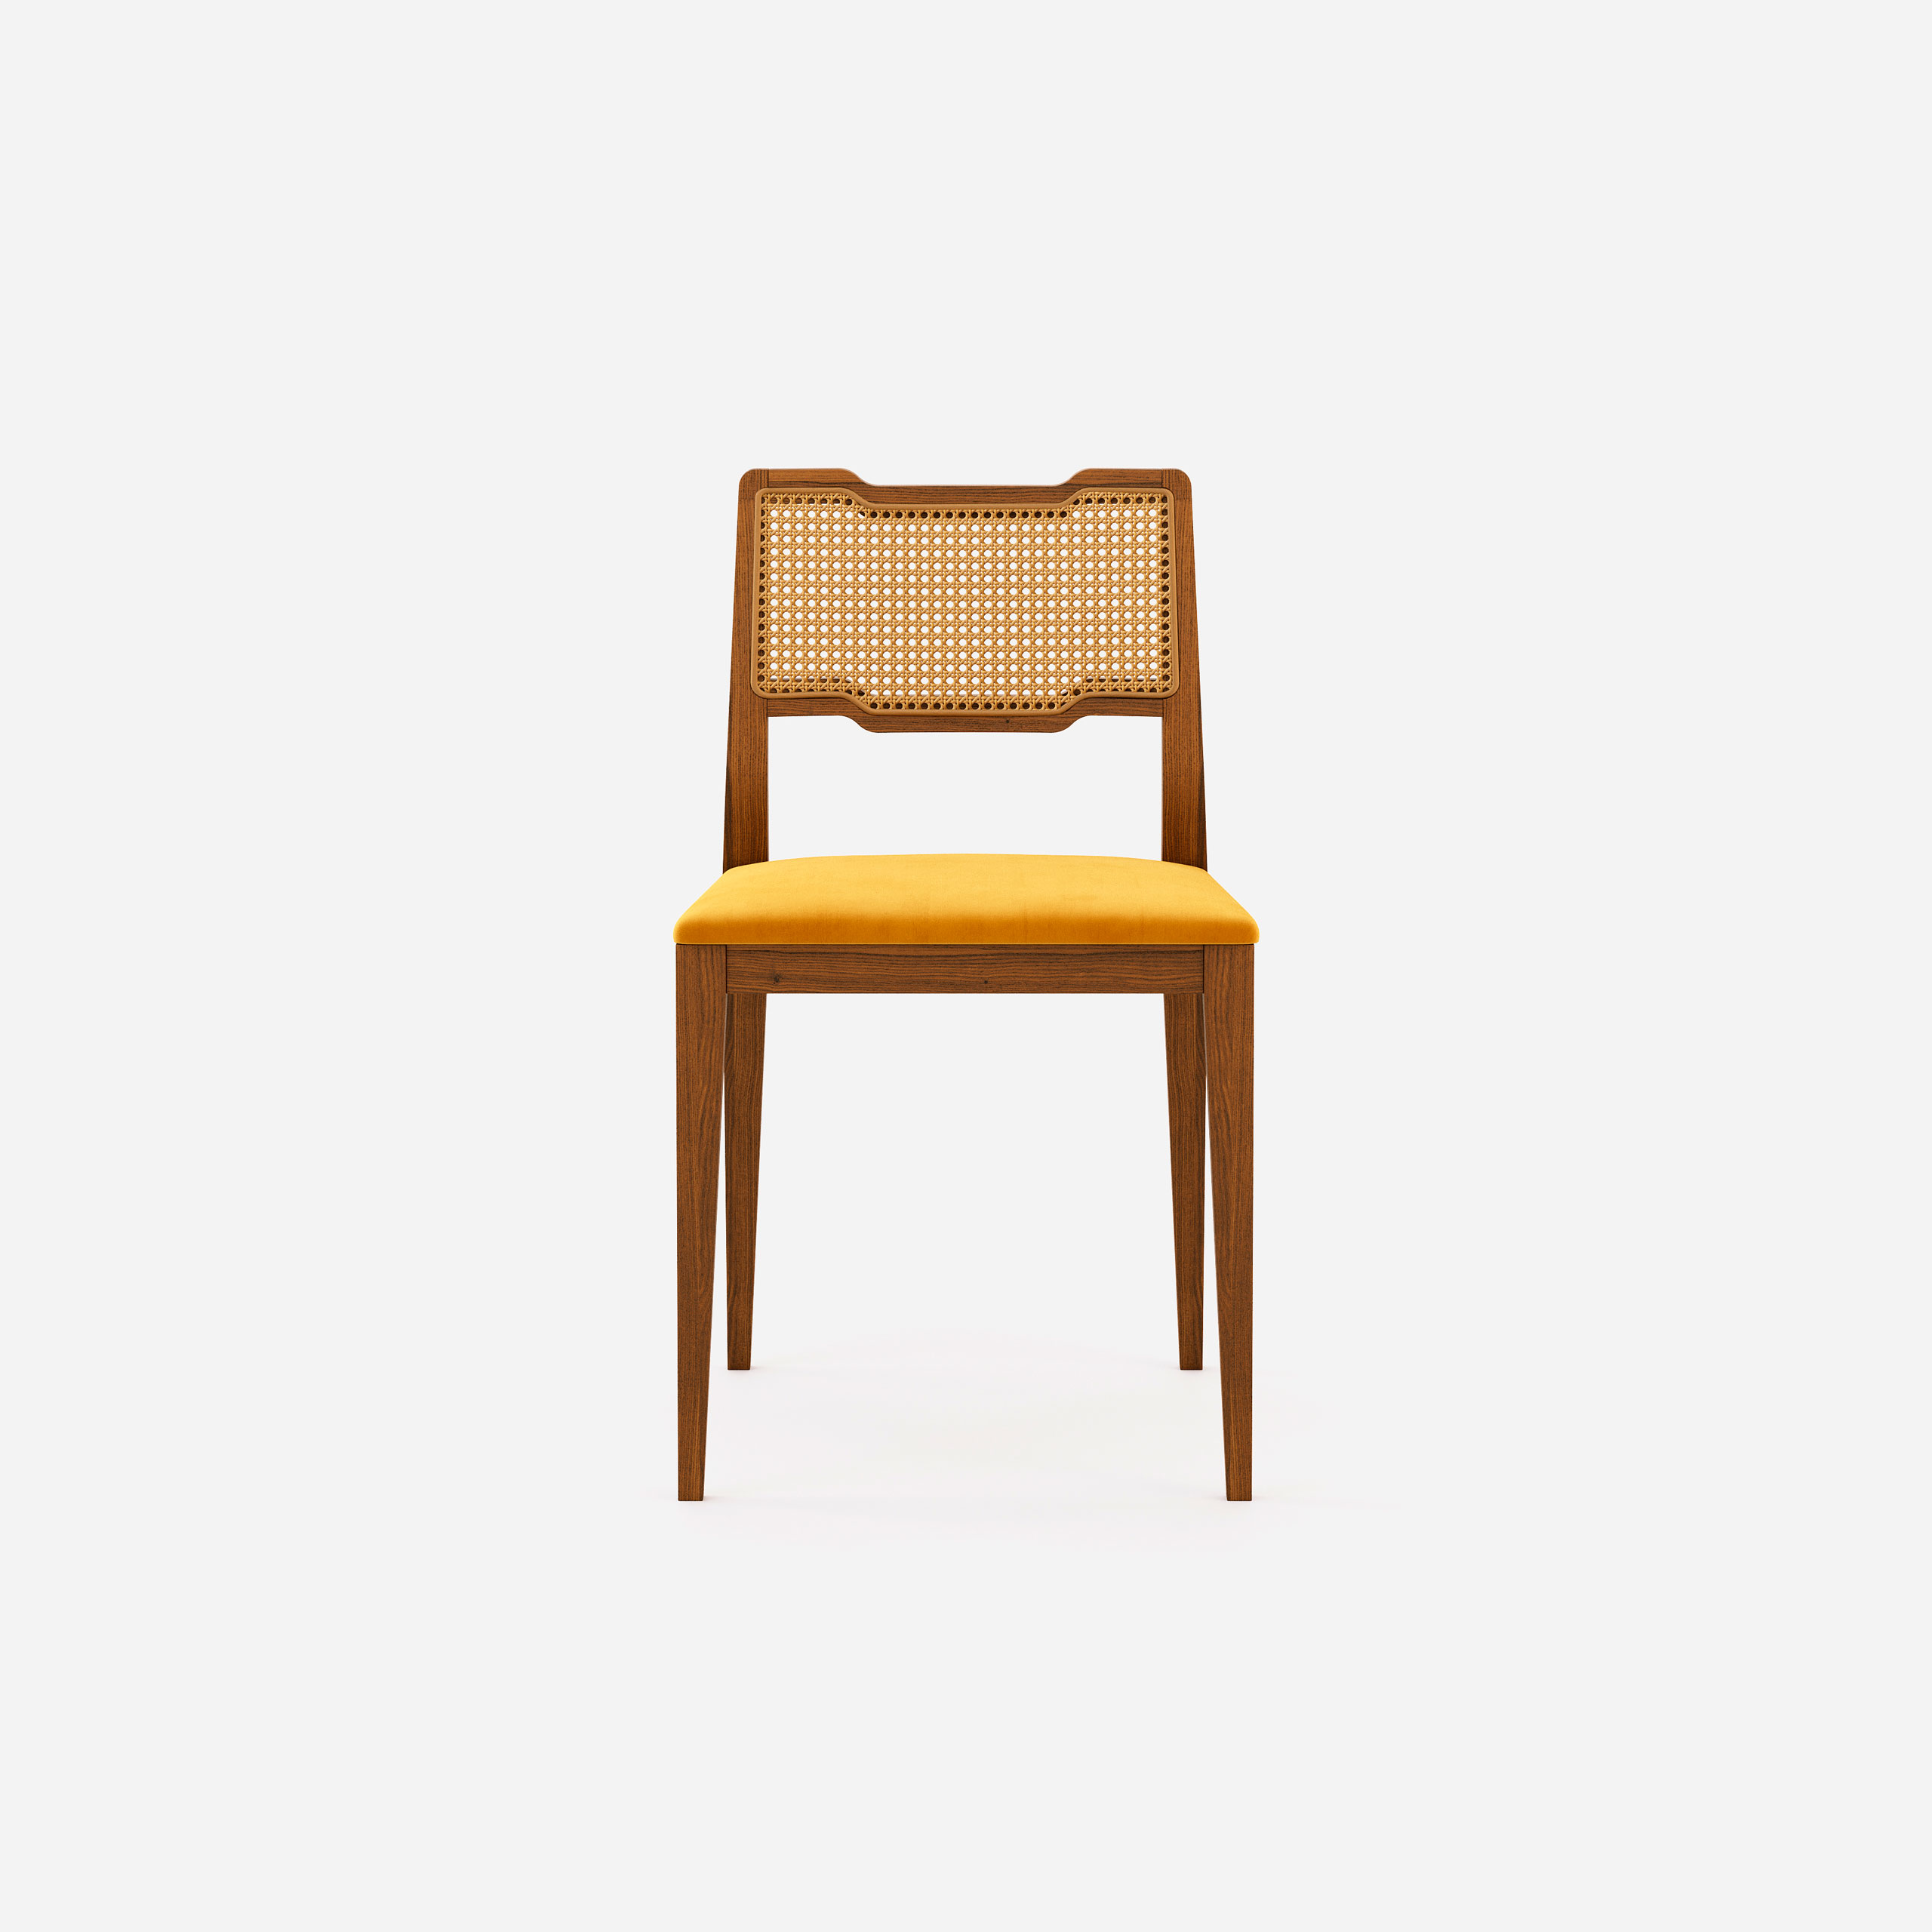 eva-chair-domkapa-new-collection-0